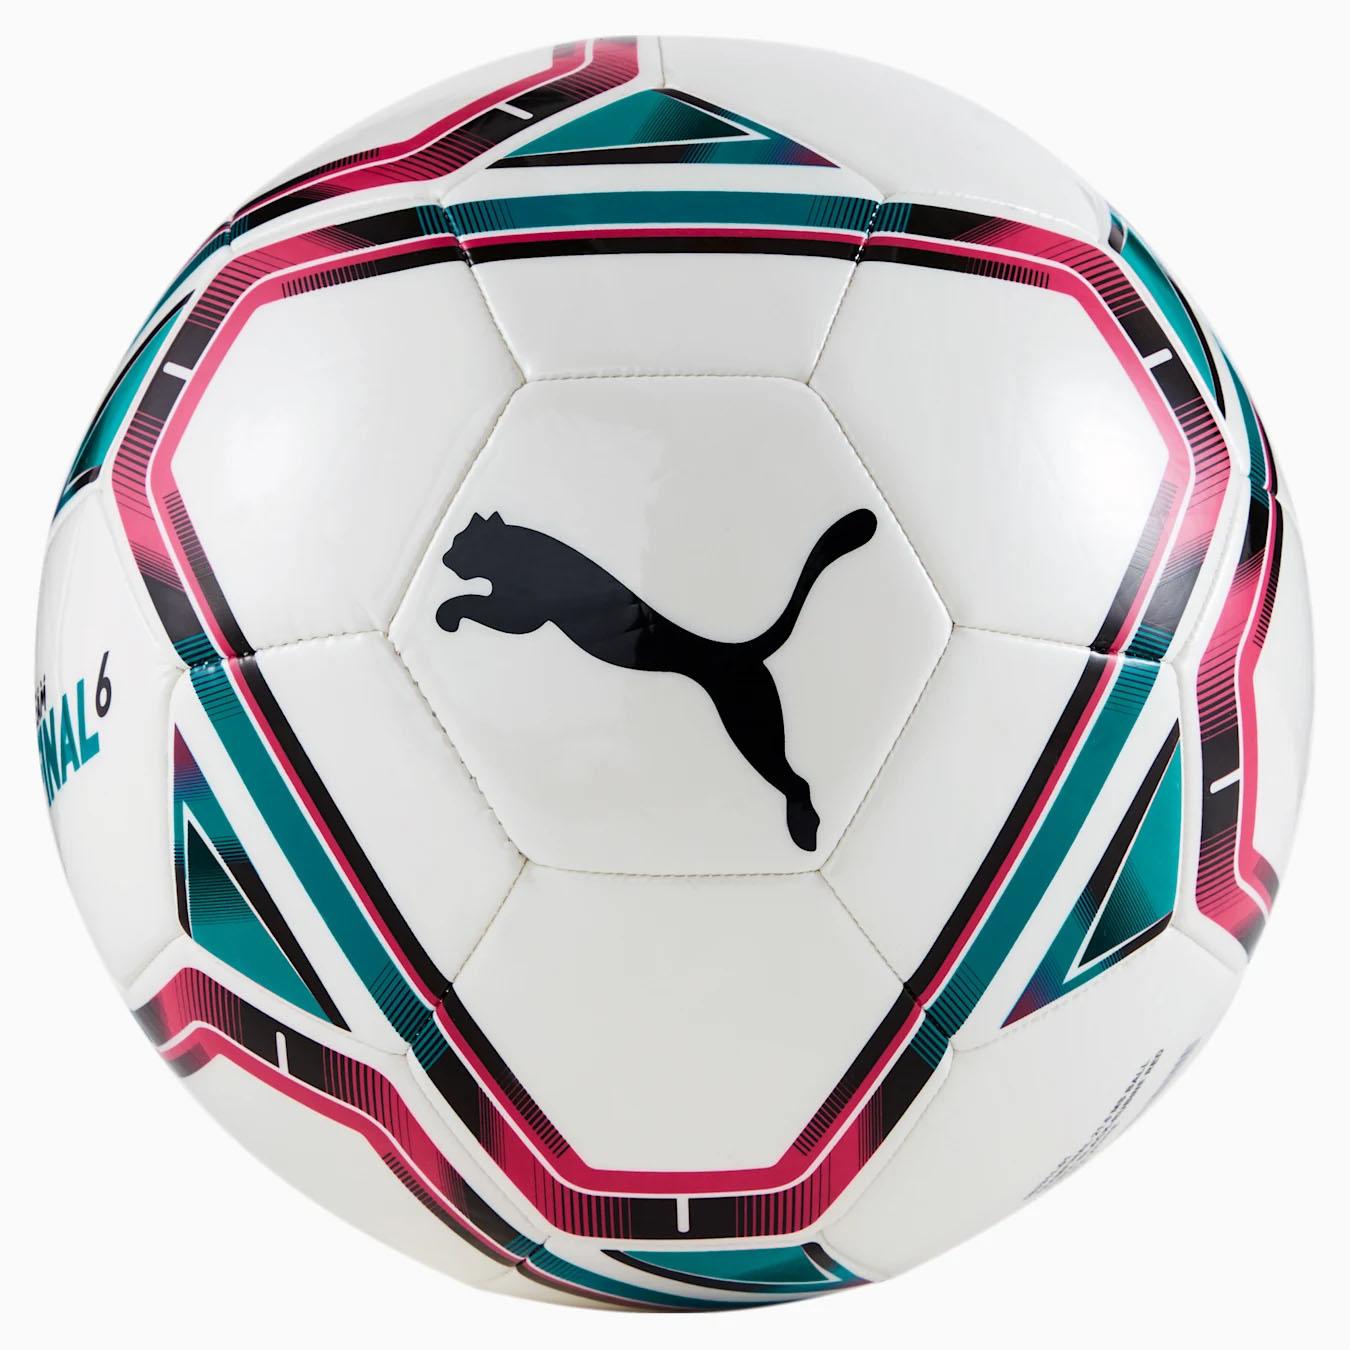 Pallone da calcio Puma Final 21.6 PUMA   634316593   083311001